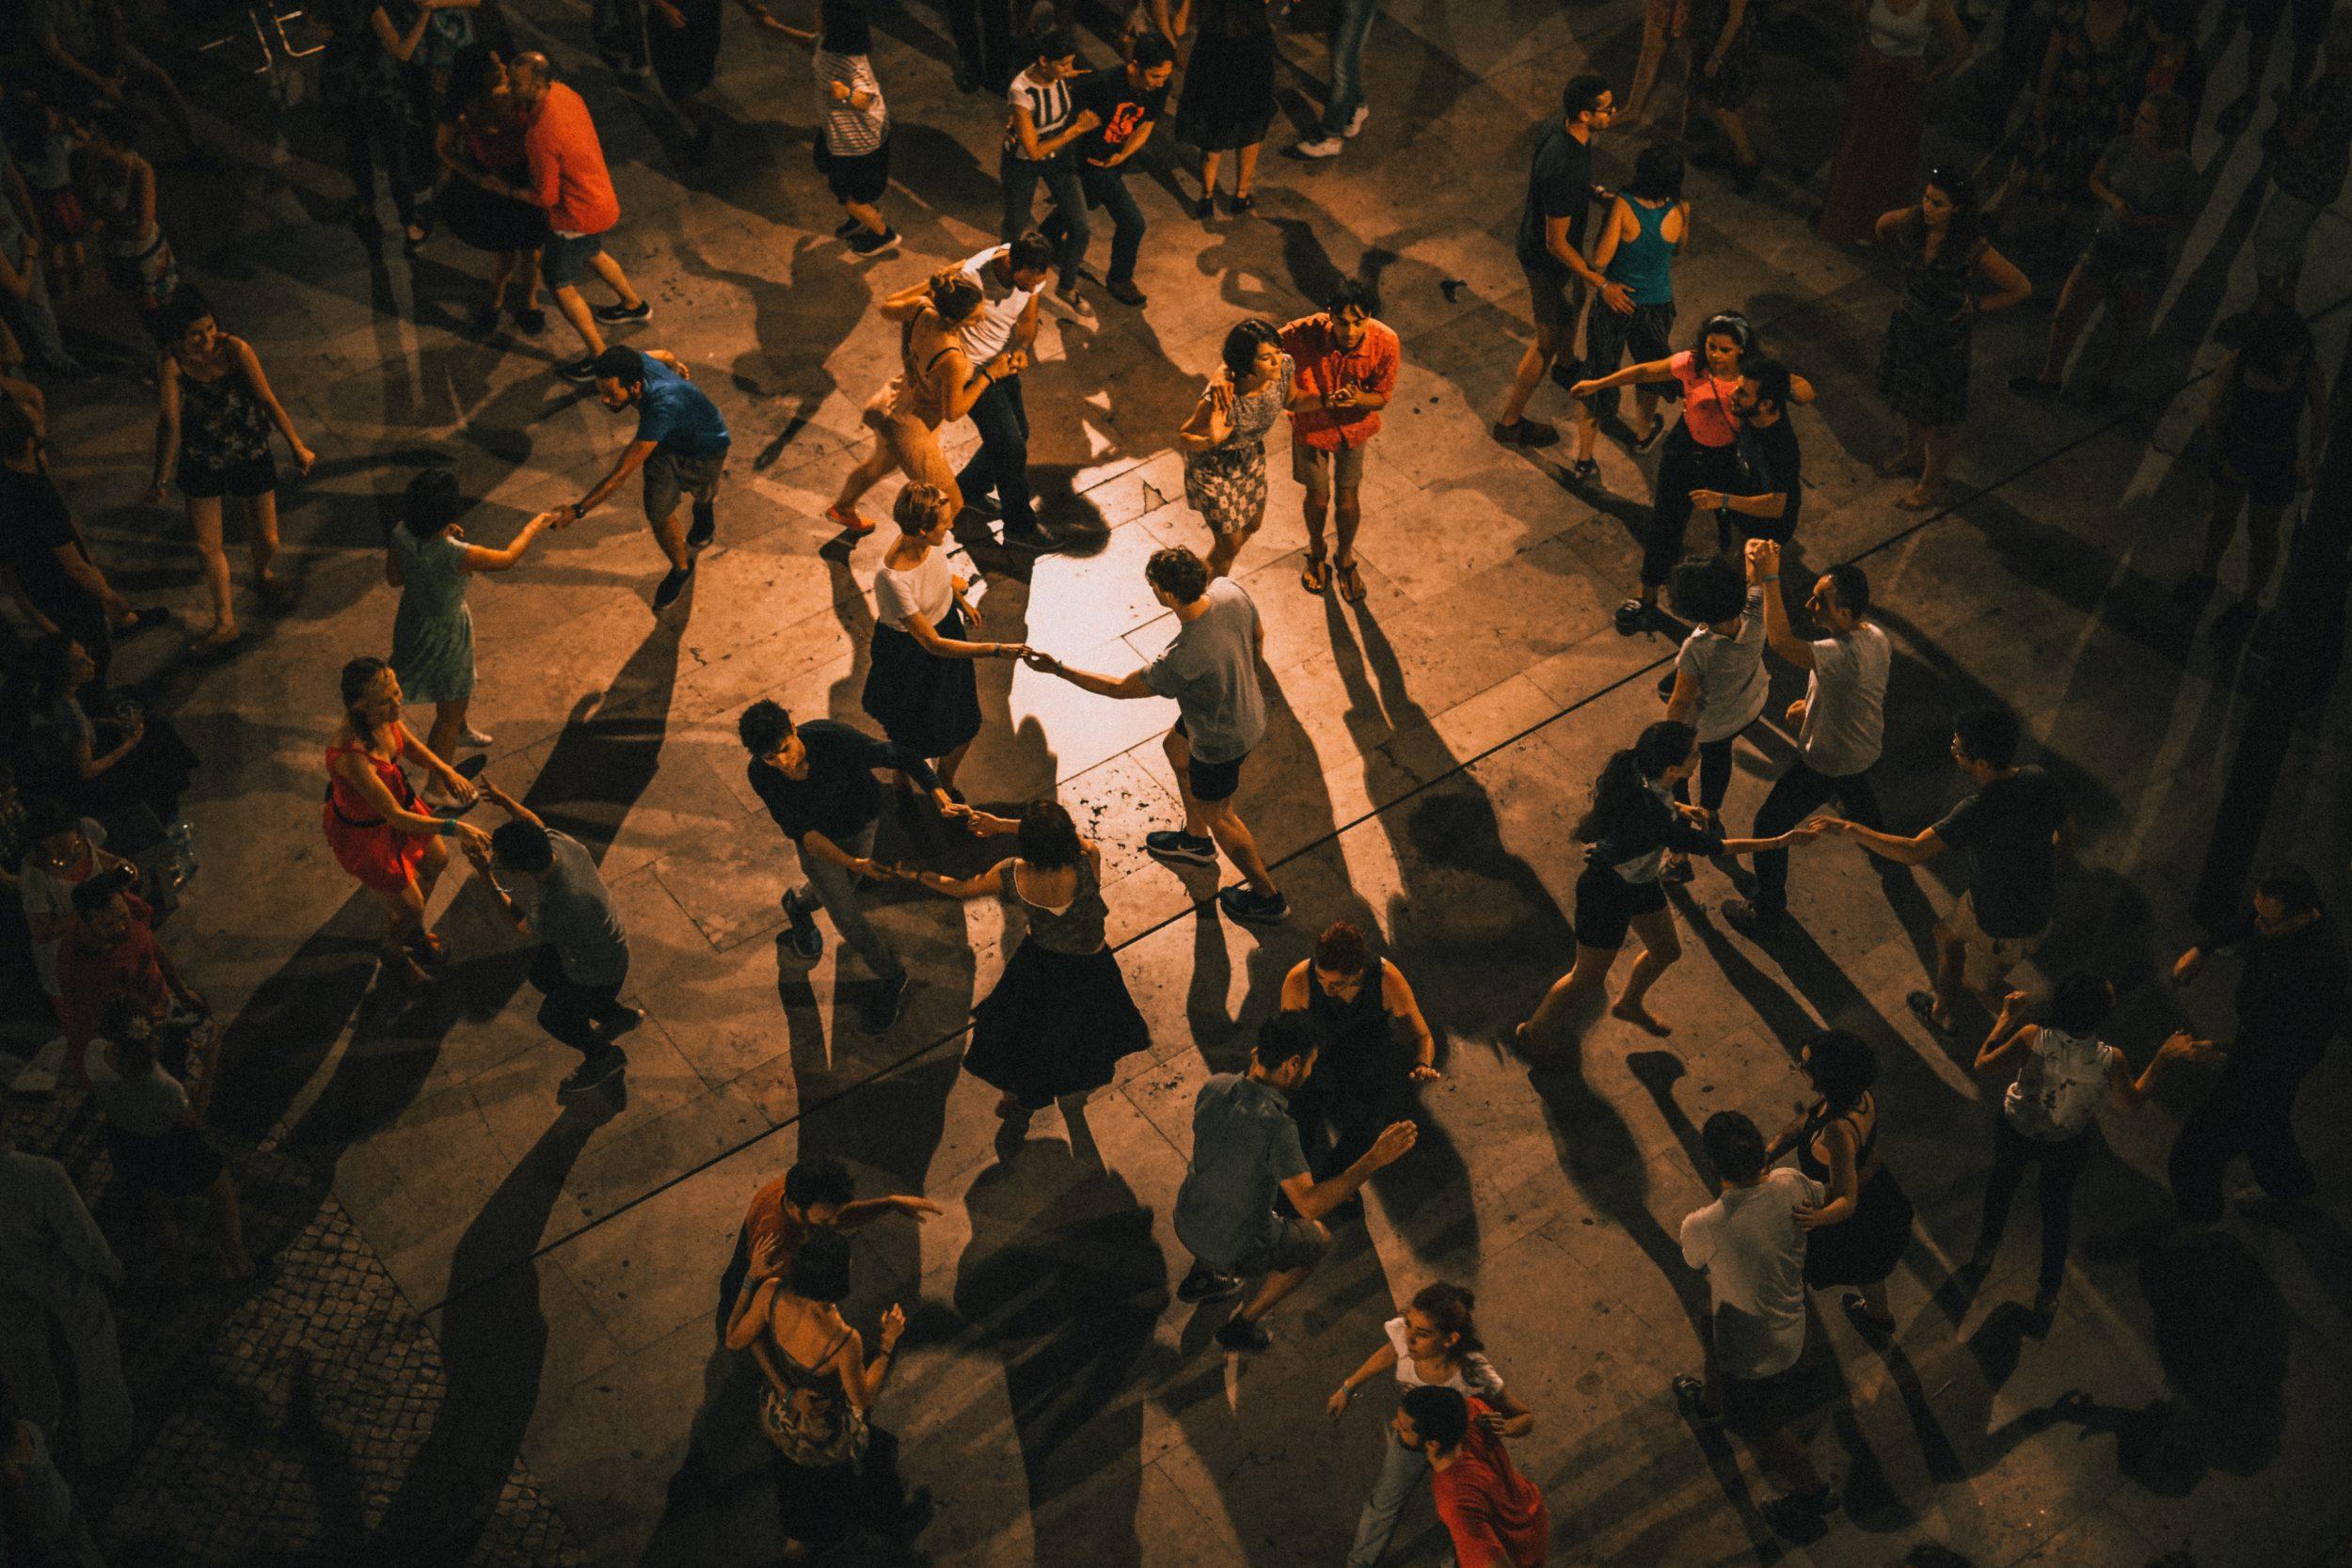 Une fête dansante